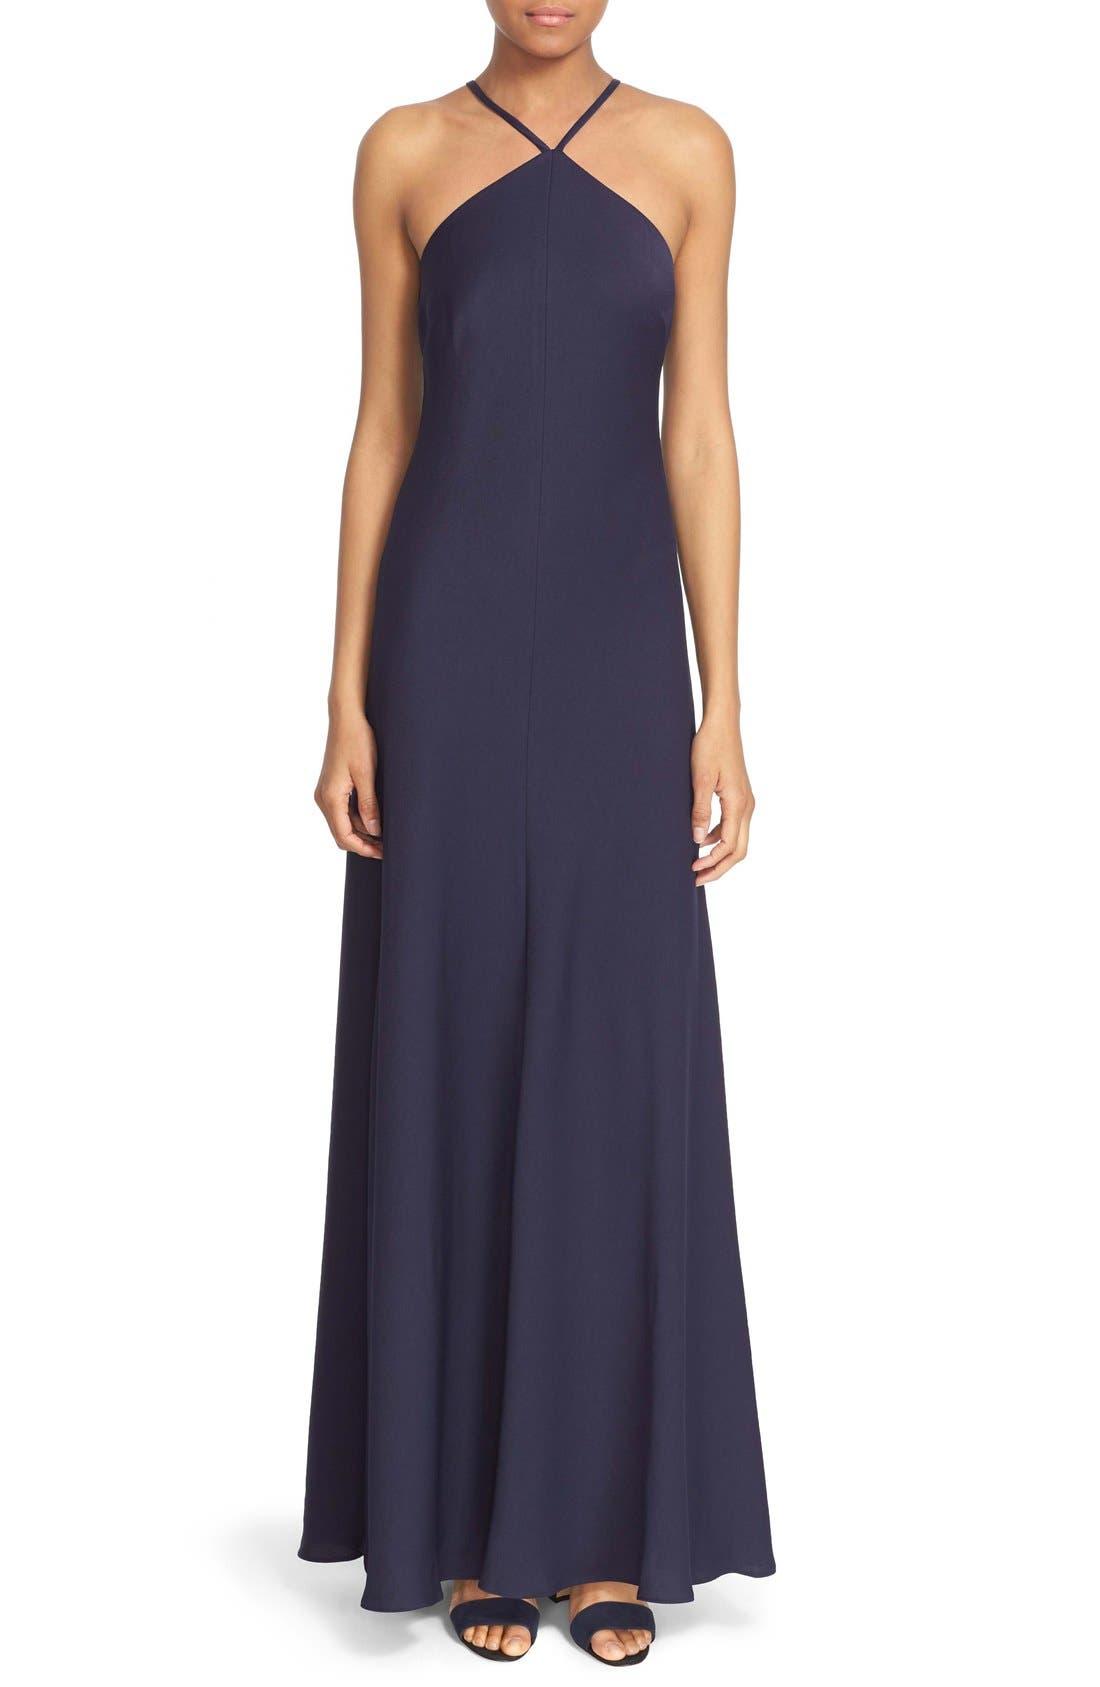 Alternate Image 1 Selected - Ted Baker London Cross Back Maxi Dress